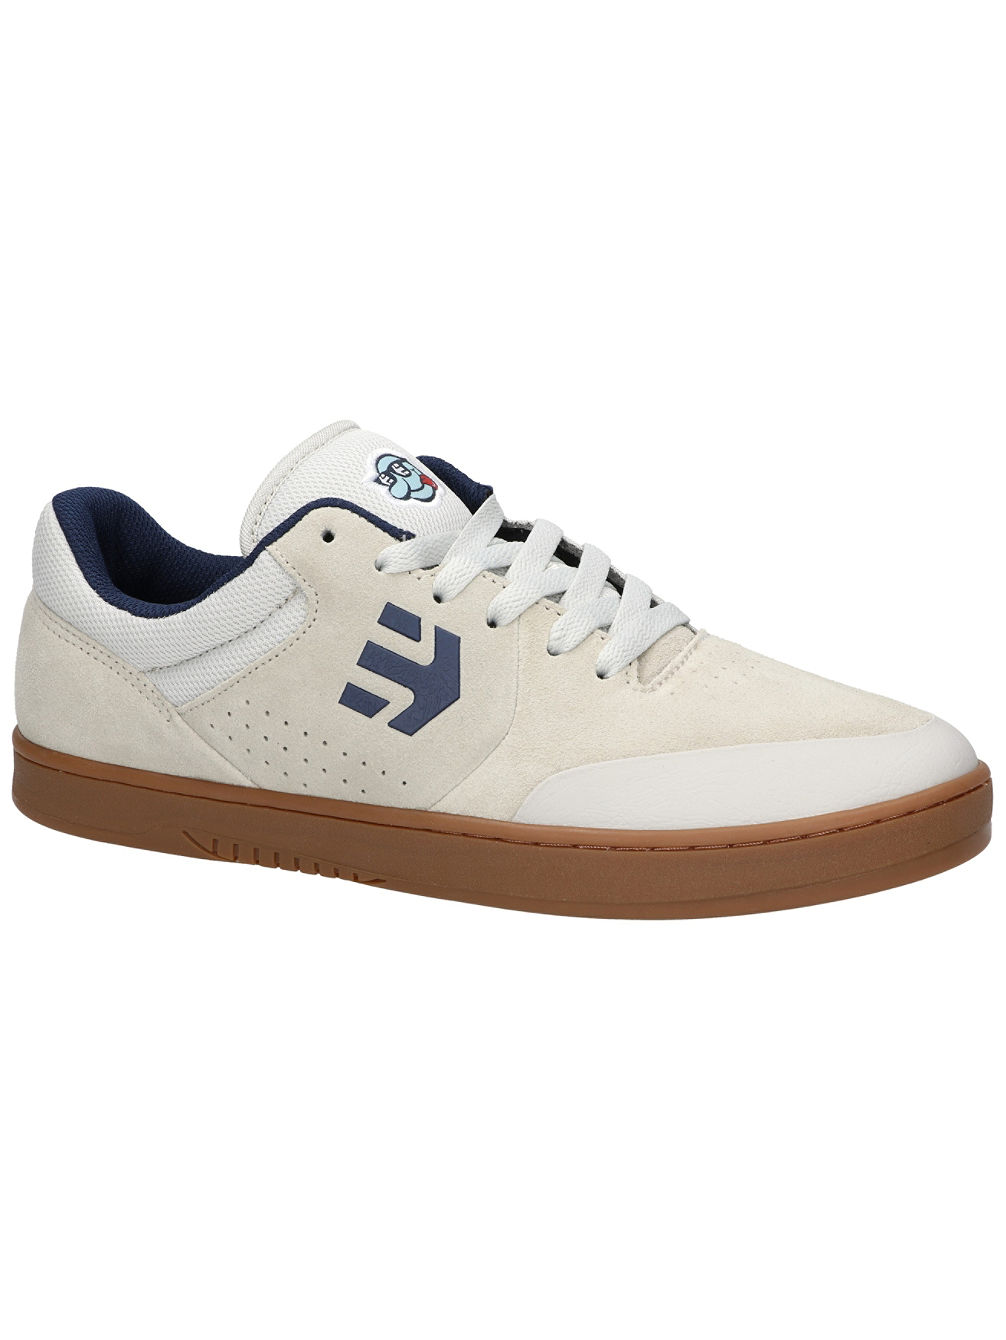 Buy Etnies X Happy Hour Marana Skate Shoes online at blue-tomato.com 993804b7b